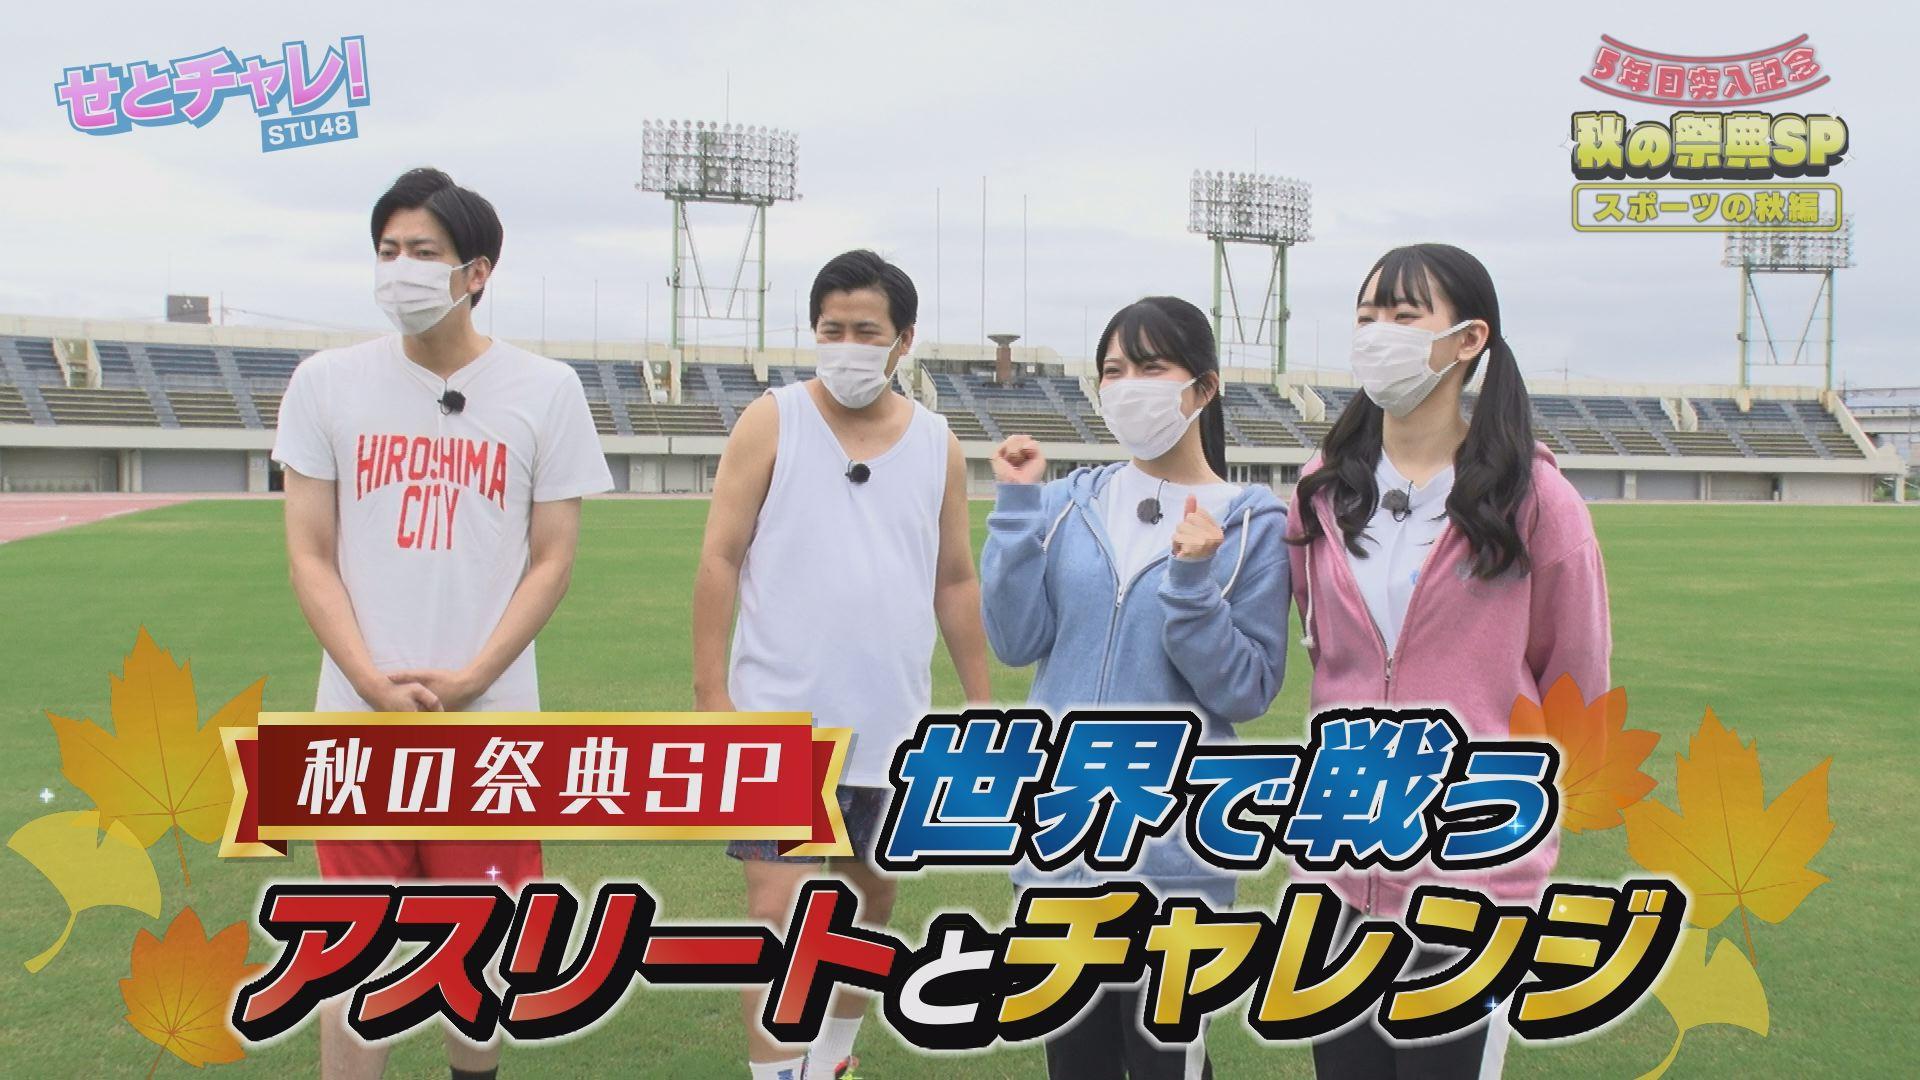 STU48が東京五輪メダリストと真剣勝負